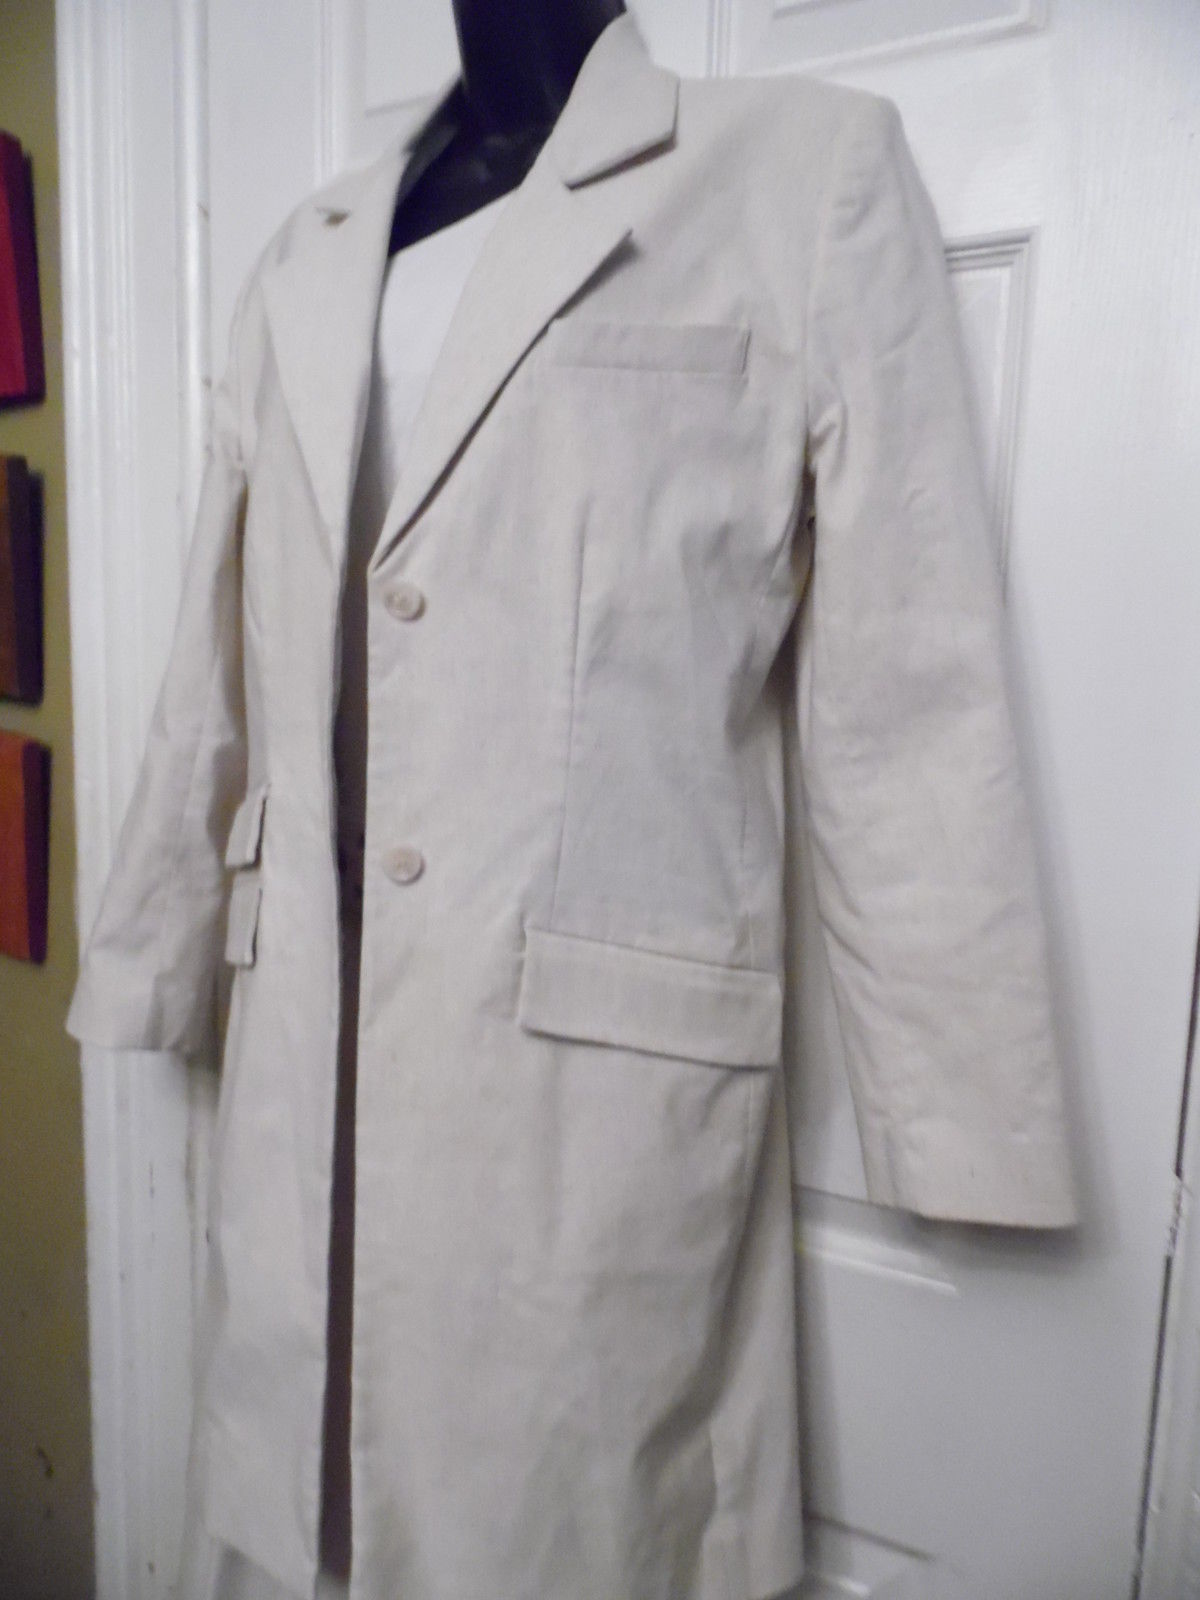 Women's Clothing Focus 2000 By Charles Glueck Size 8 Pant Suit Beige Tan Linen